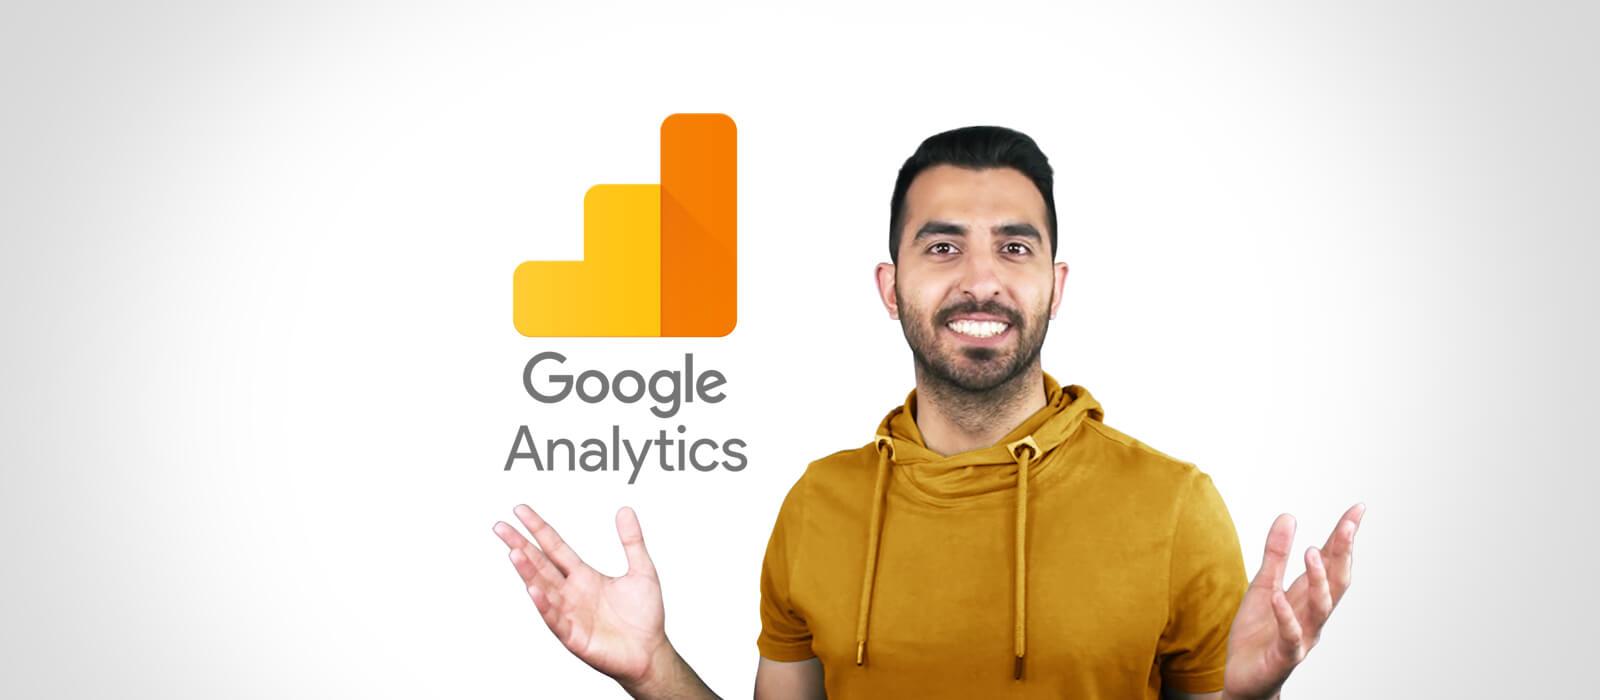 google-analytic-course-digital-marketing-pouya-eti